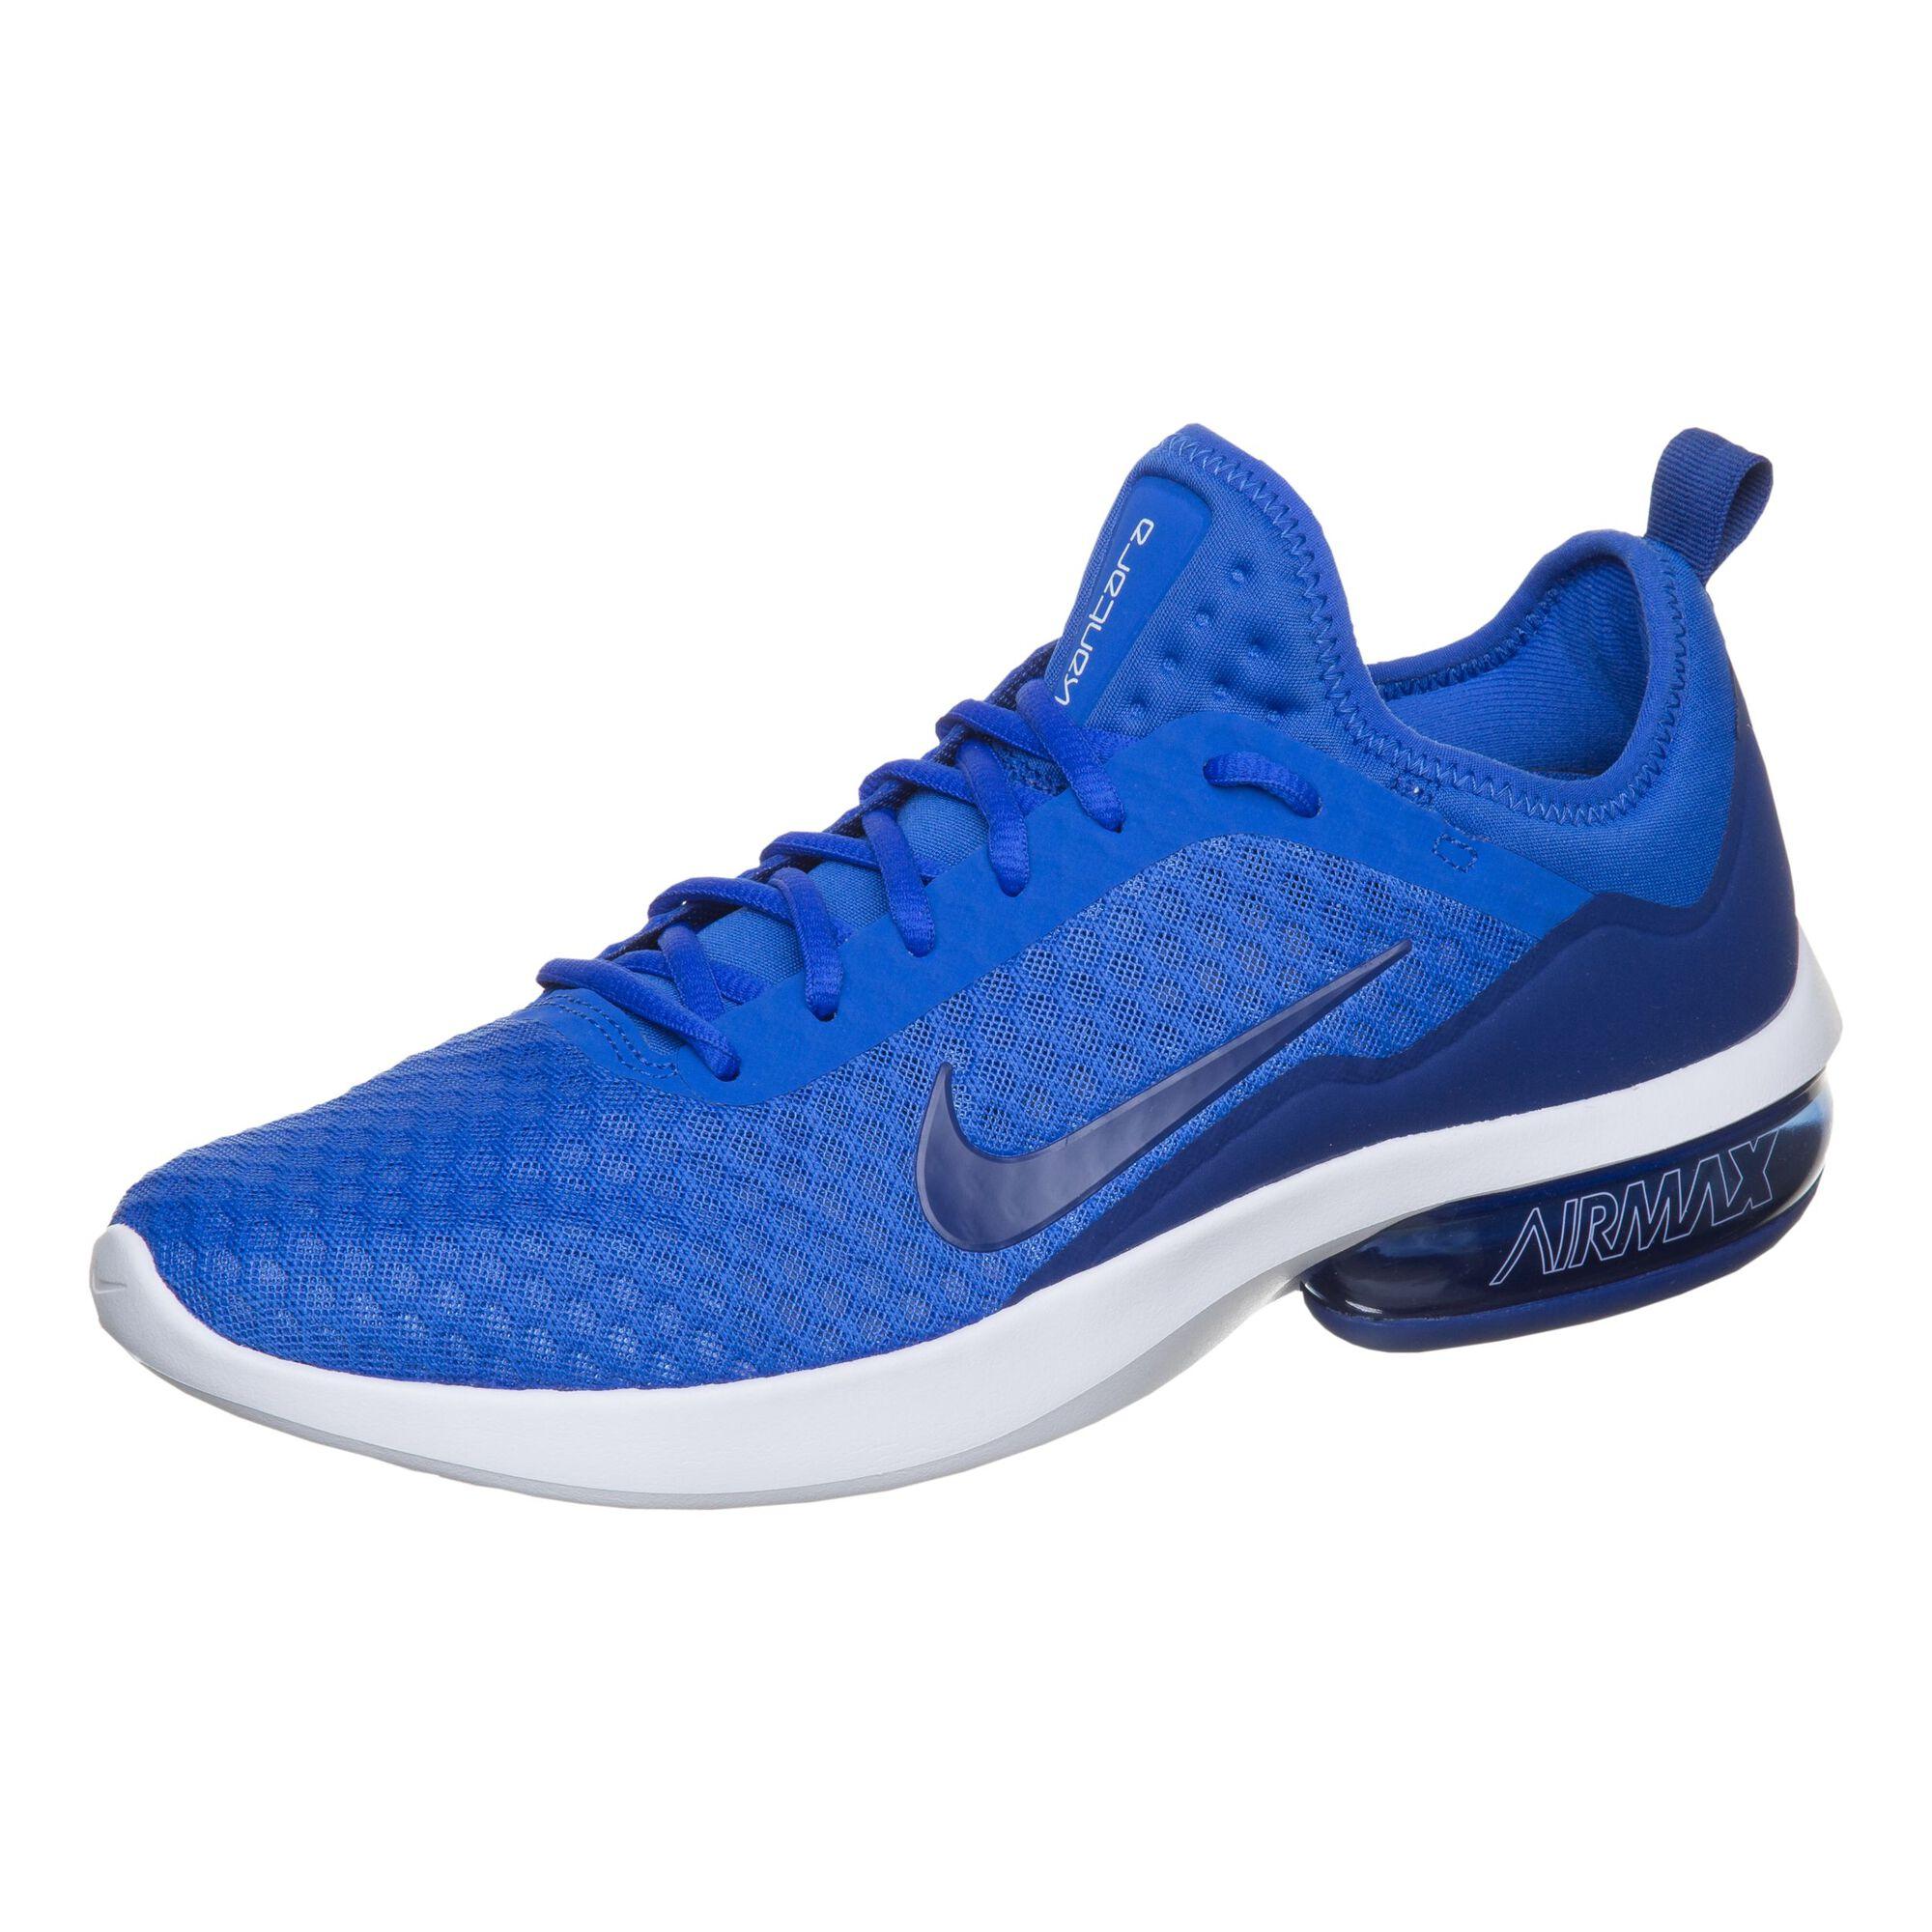 65f9da13d9 buy Nike Air Max Kantara Neutral Running Shoe Men - Blue, White ...